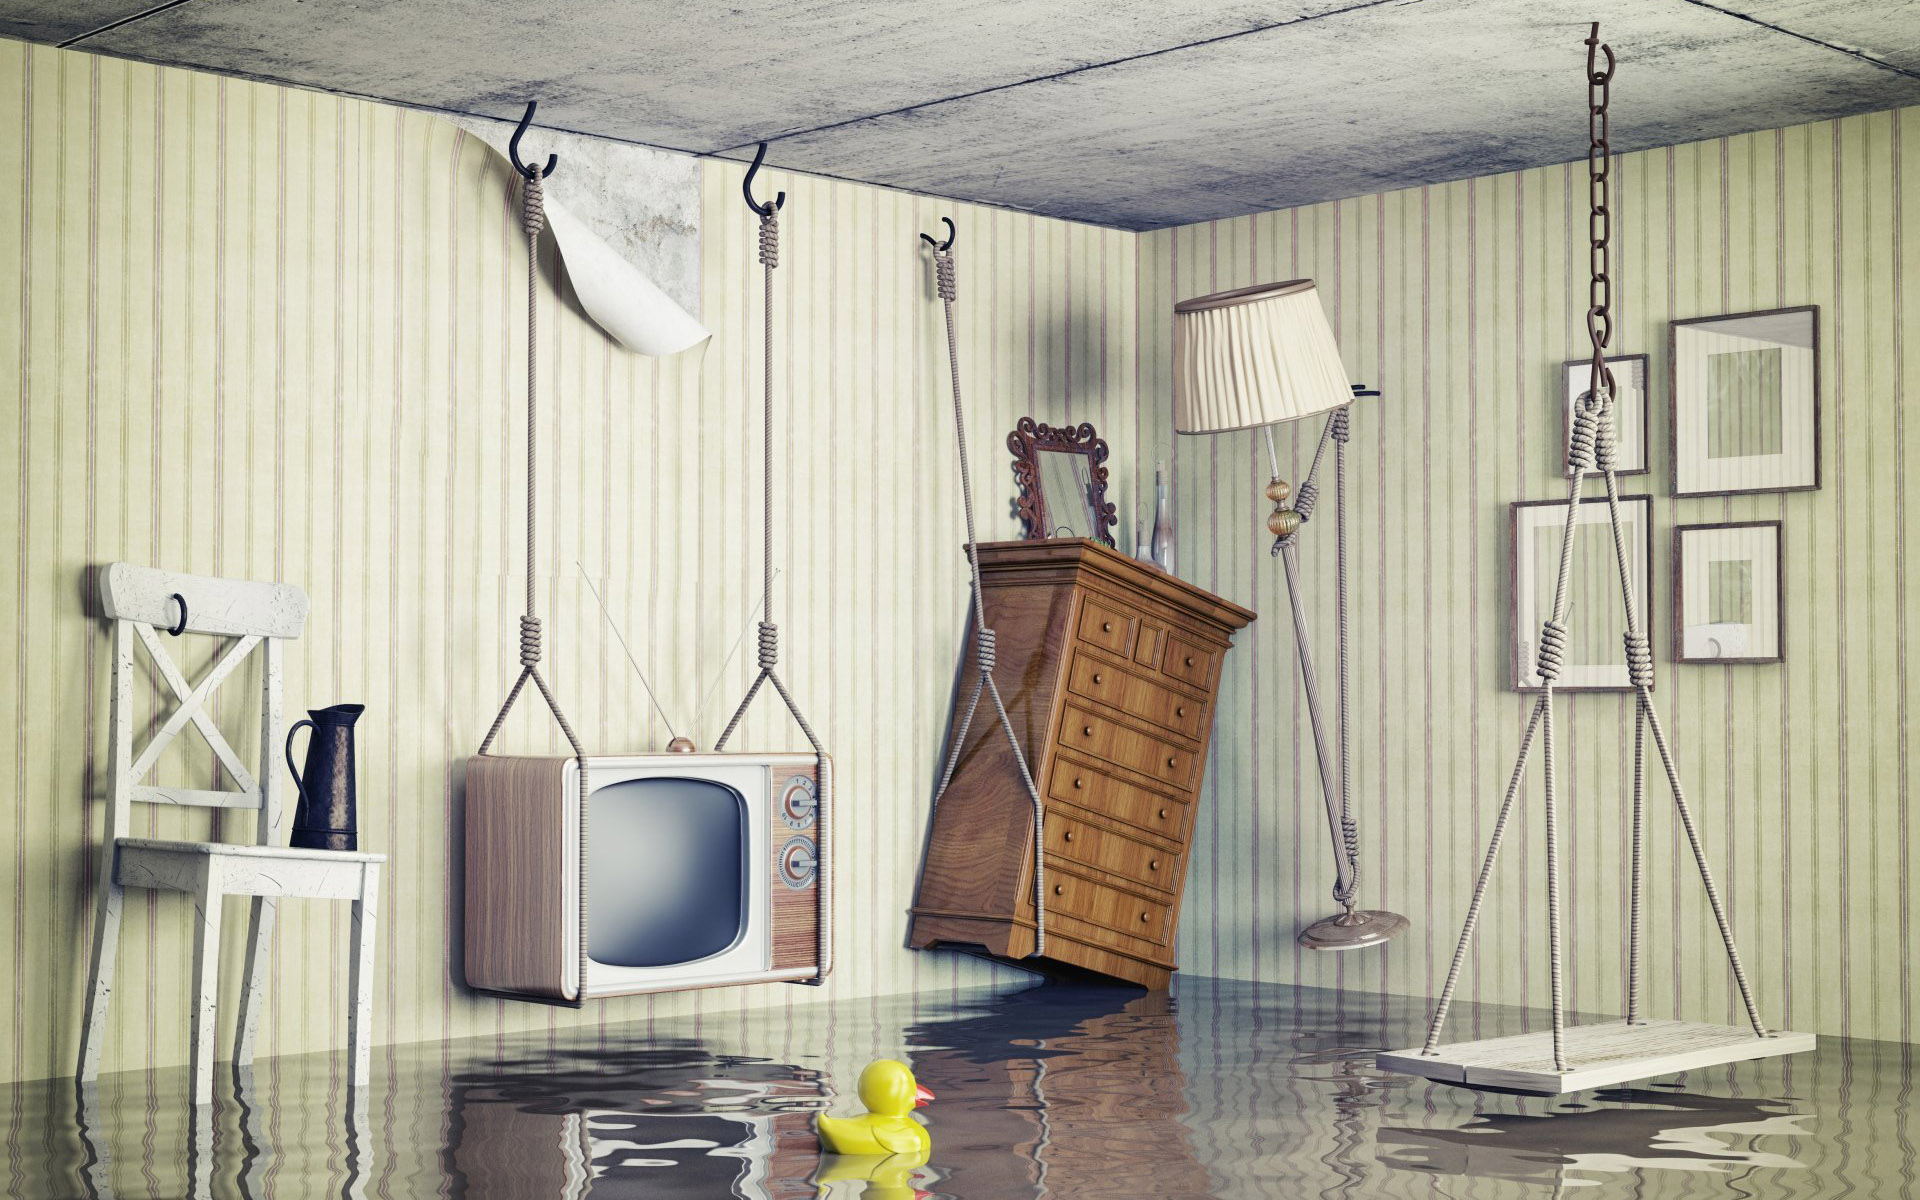 Затопило квартиру: как спасти ремонт